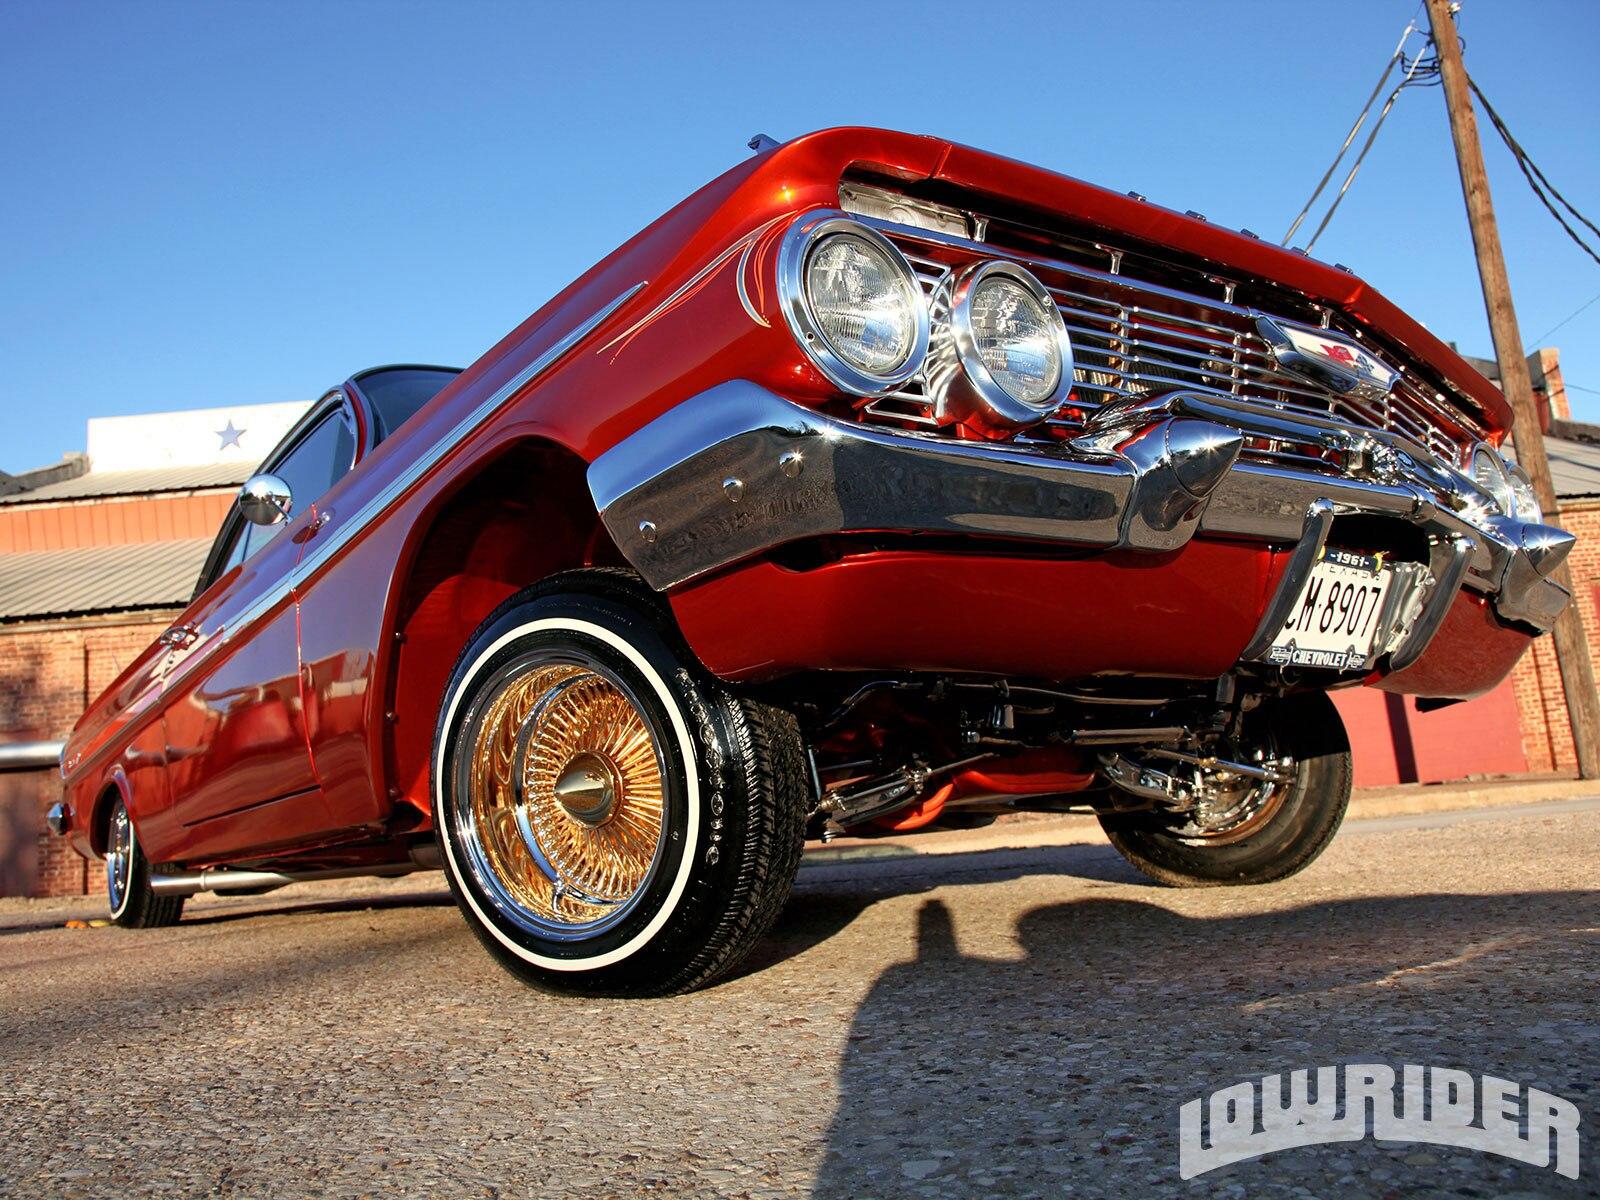 1304-lrmp-06-o-1961-chevrolet-impala-gold-daytons2